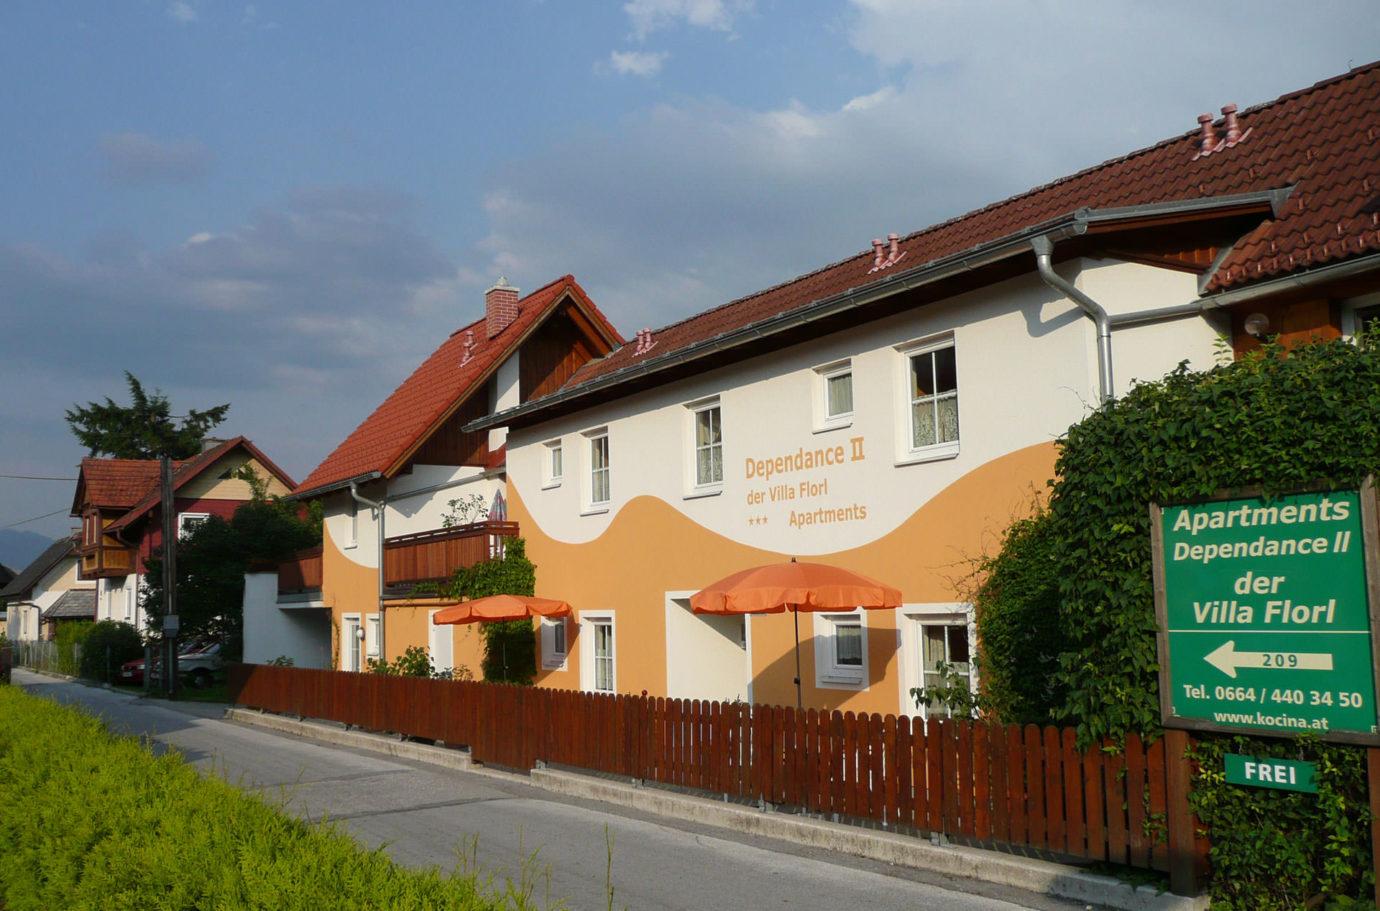 Dependance II der Villa Florl ***Apartments